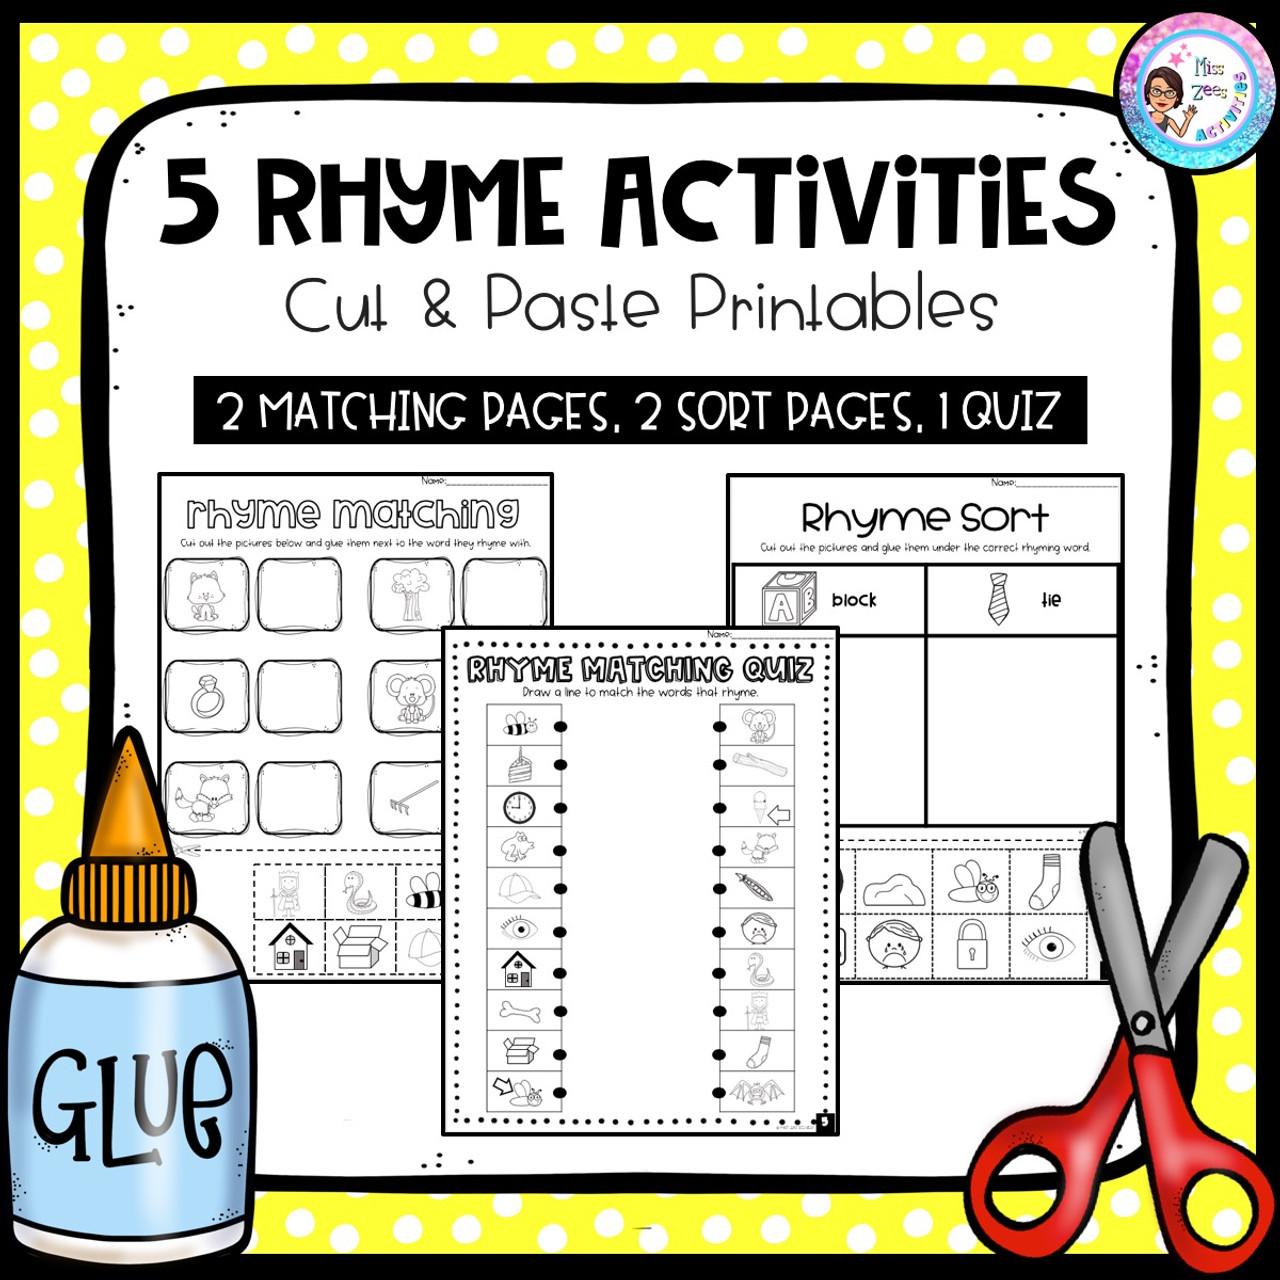 medium resolution of 5 Rhyme Activities: Cut \u0026 Paste Printables - Amped Up Learning